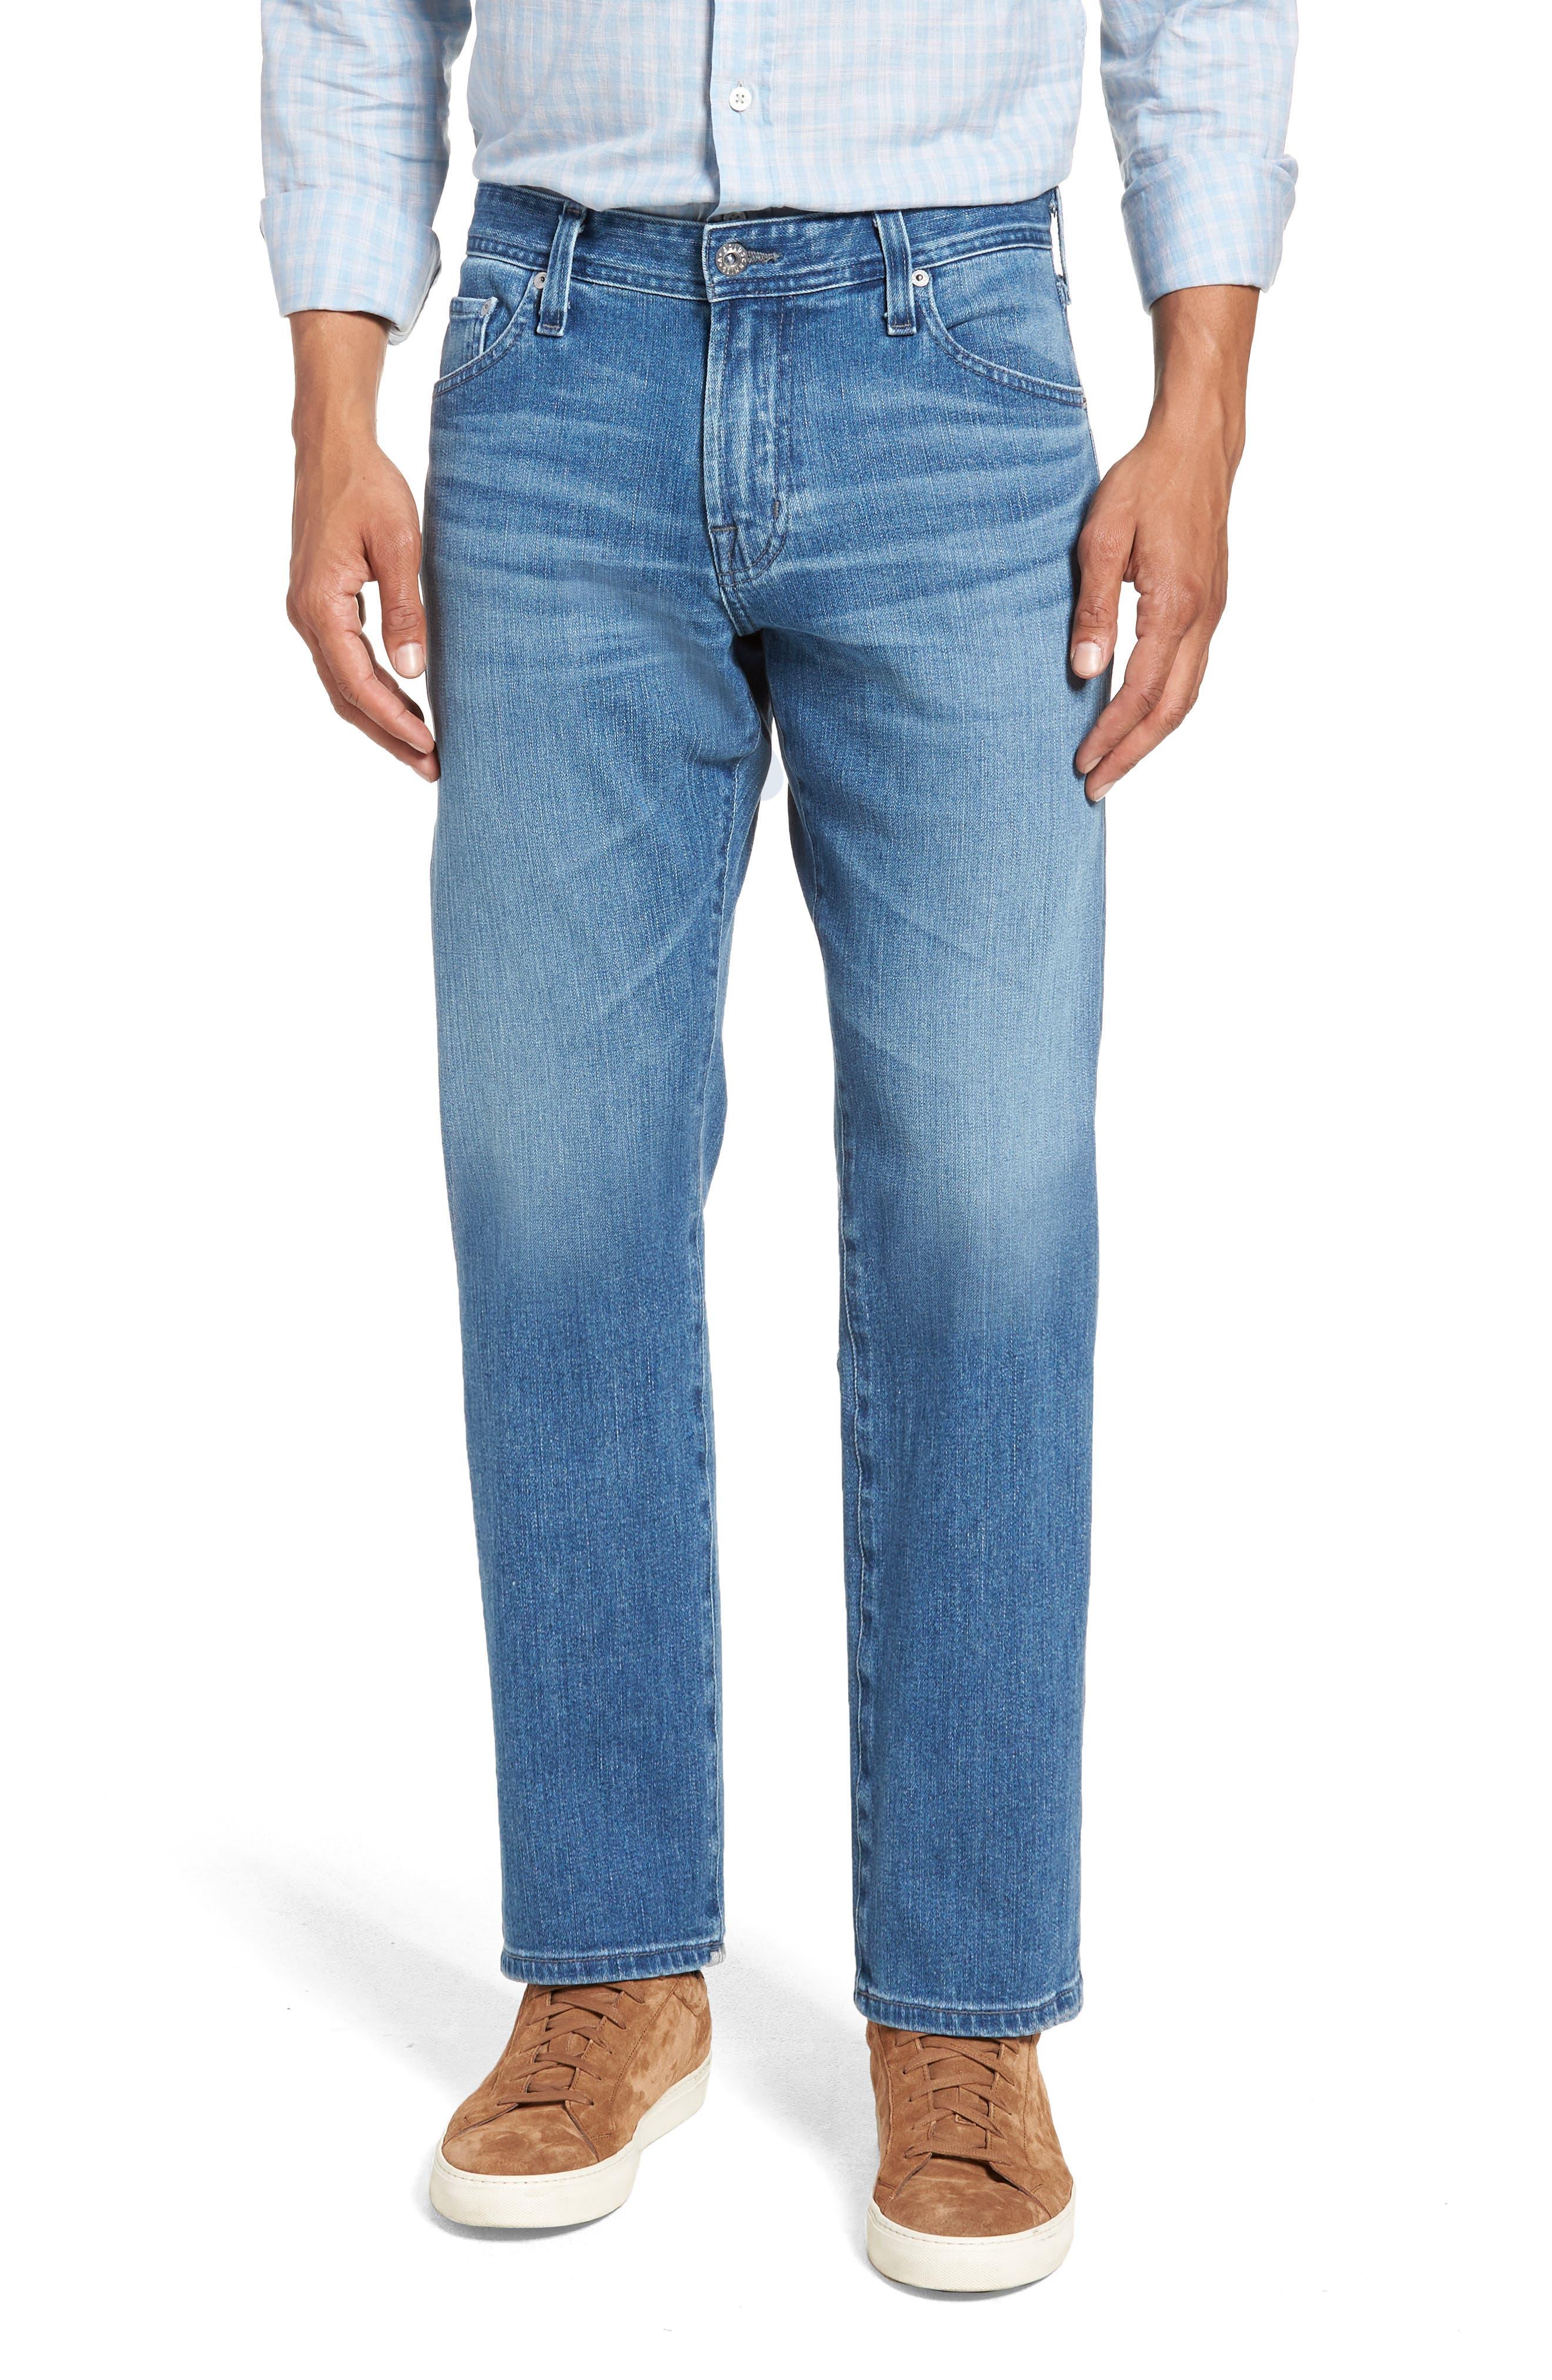 Graduate Slim Straight Leg Jeans,                         Main,                         color, DEMOLITION